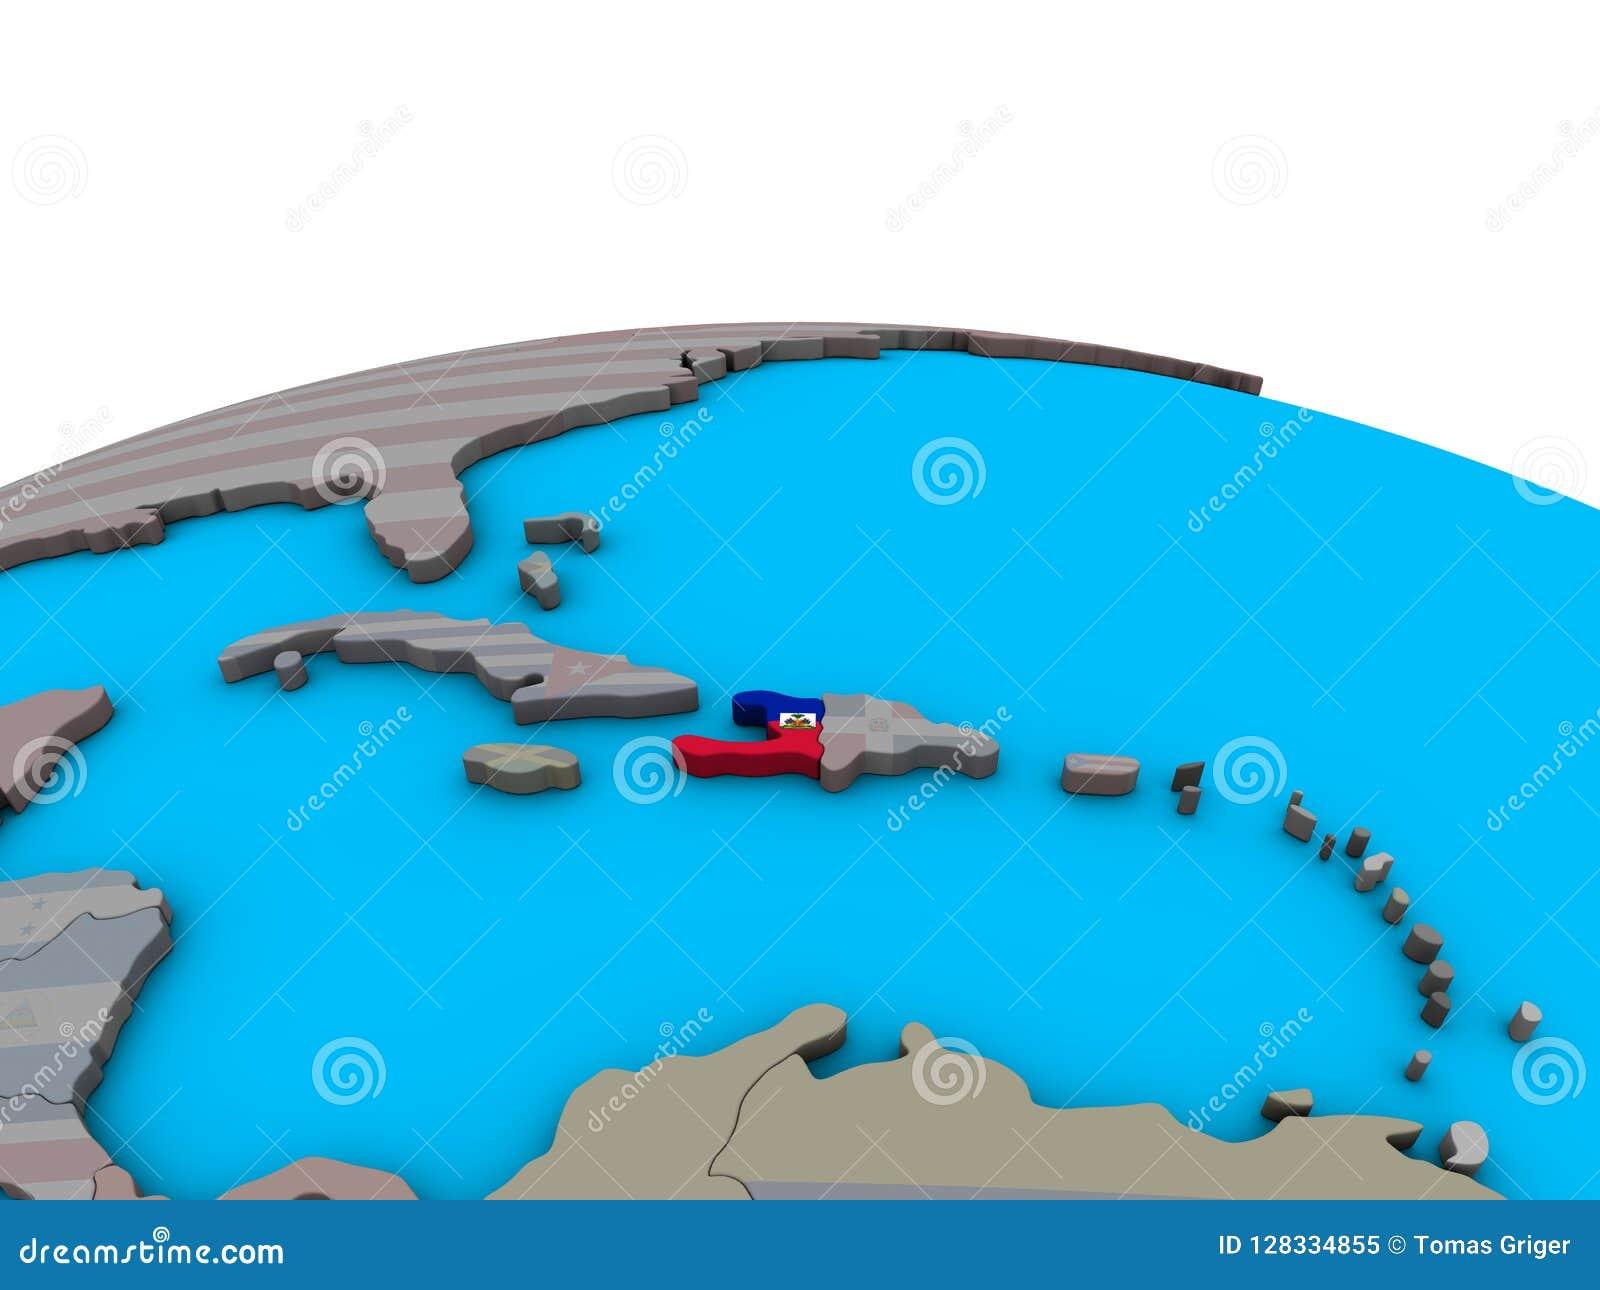 Haiti Karte.Karte Von Haiti Mit Flagge Auf Kugel Stock Abbildung Illustration